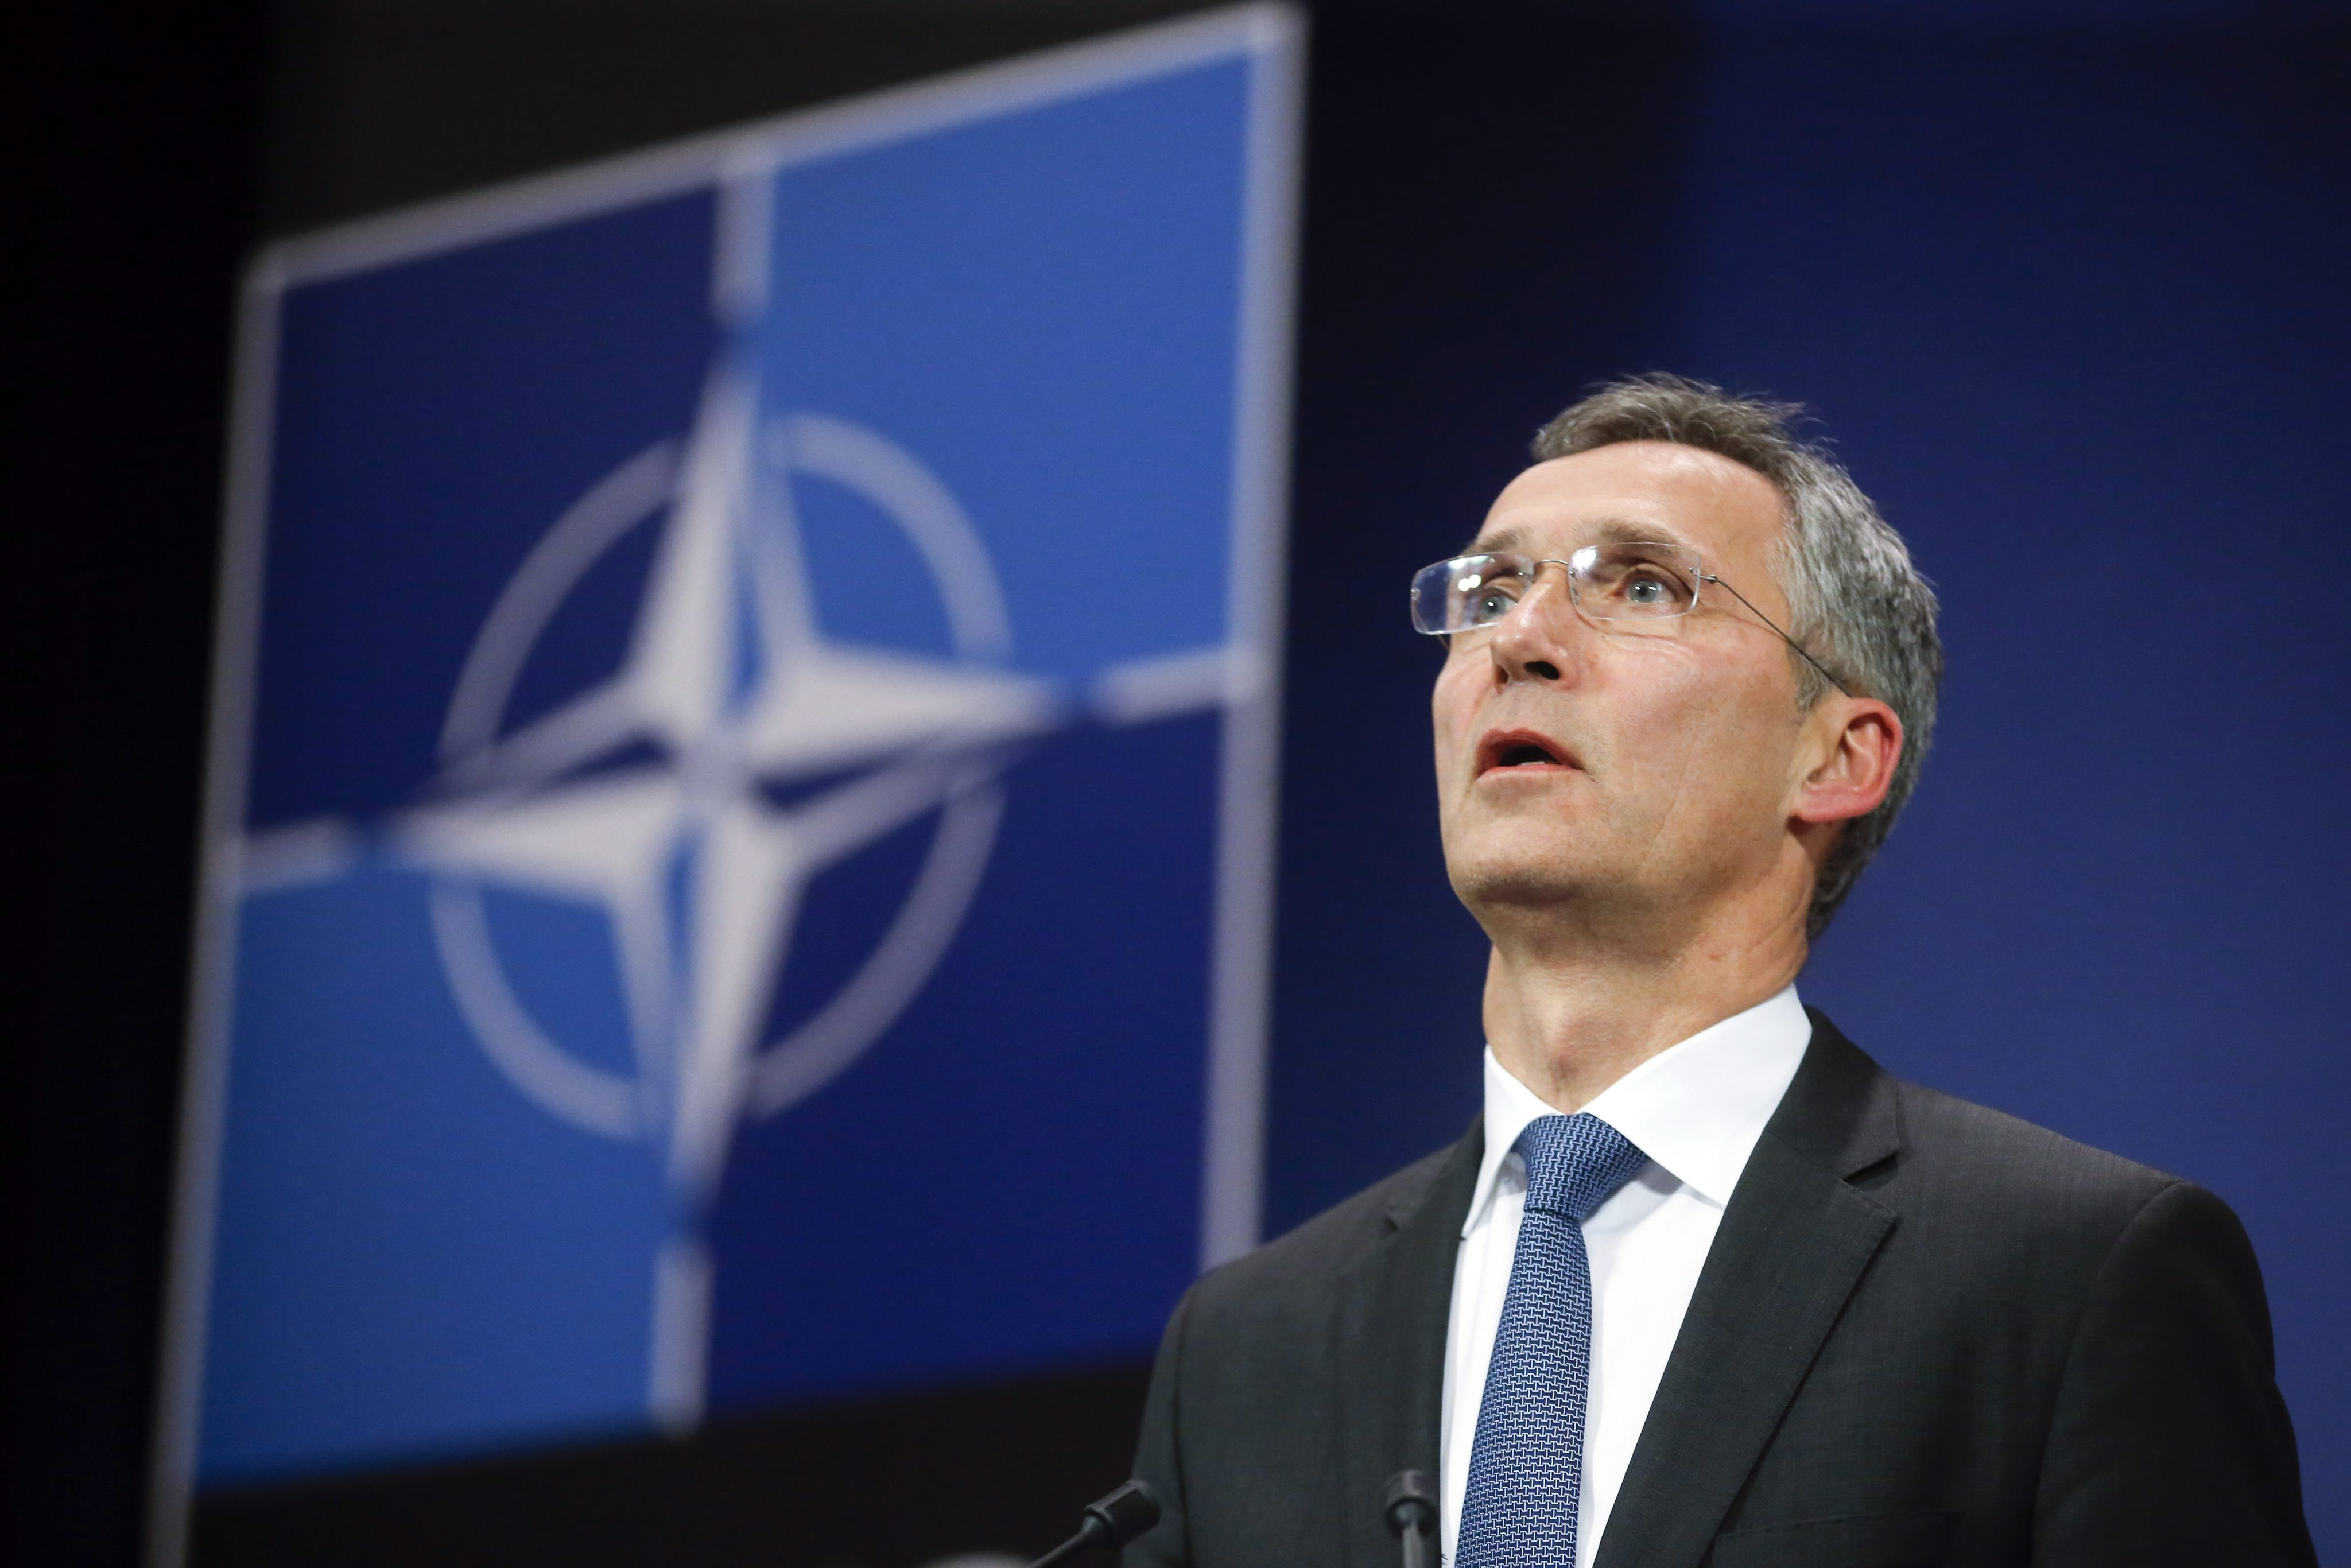 NATO Secretary General Jens Stoltenberg briefs the press overnight. EPA/OLIVIER HOSLET